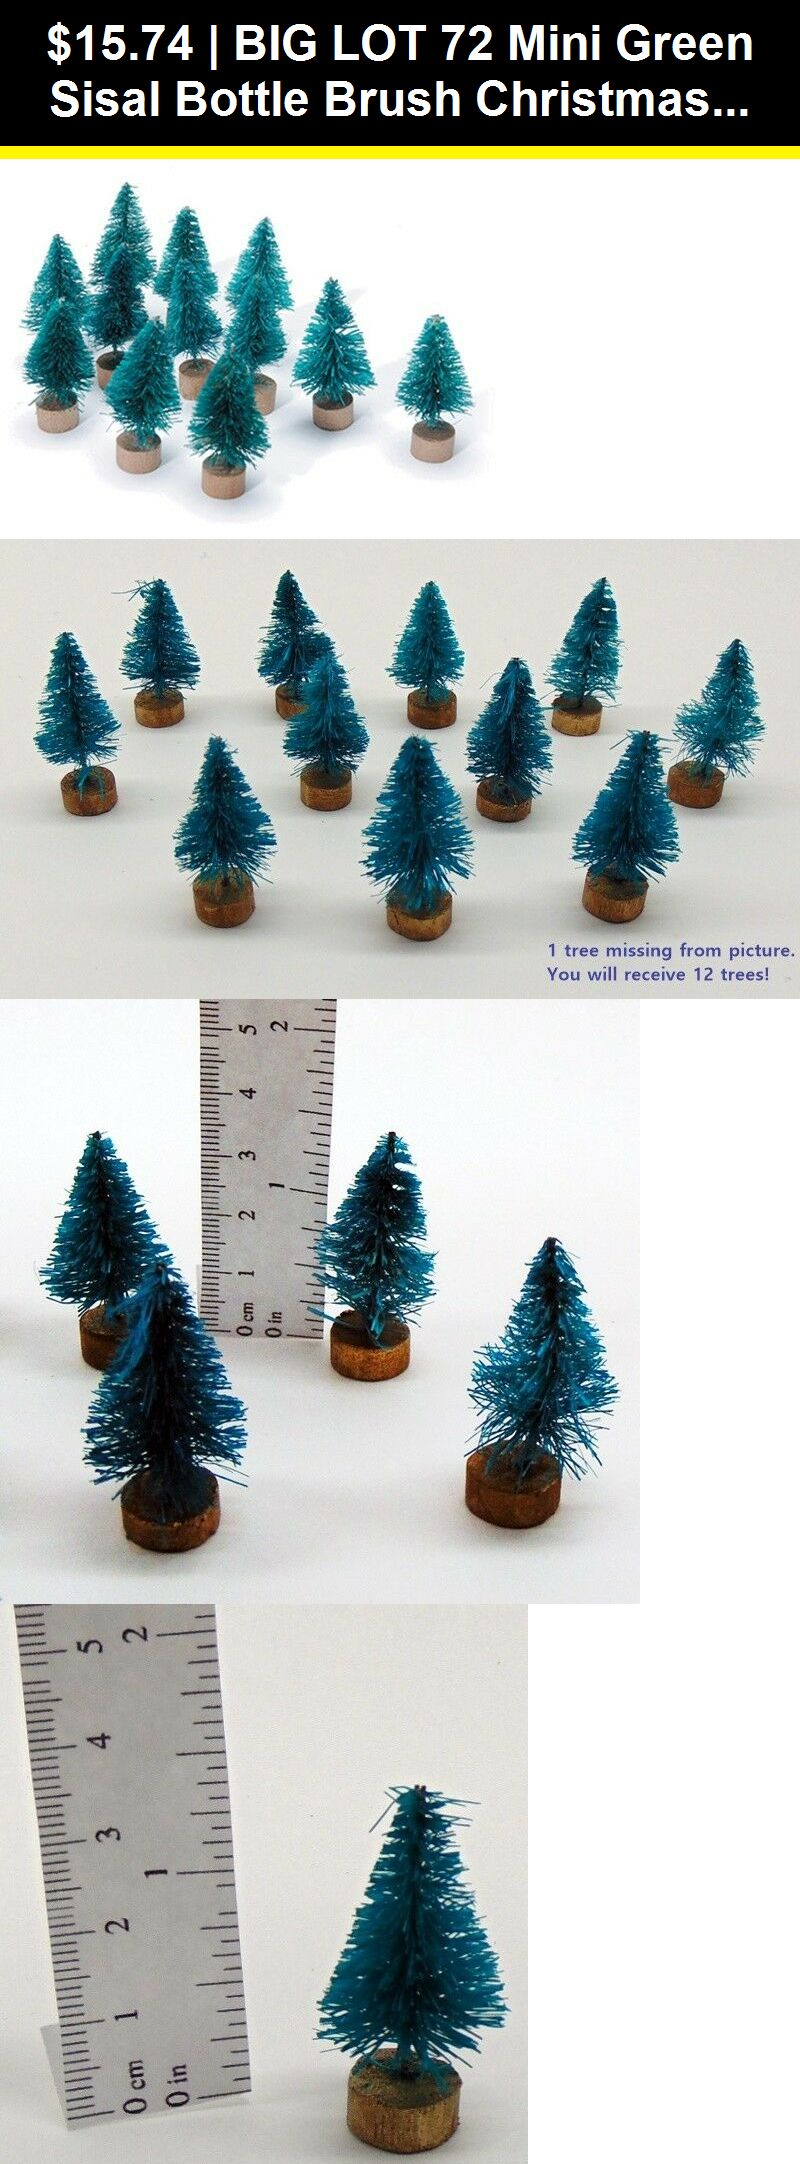 Craft Bells 116640 Big Lot 72 Mini Green Sisal Bottle Brush Christmas Trees 1 Tall 1 5 W Base Buy It No Bottle Brush Christmas Trees Craft Bells Christmas